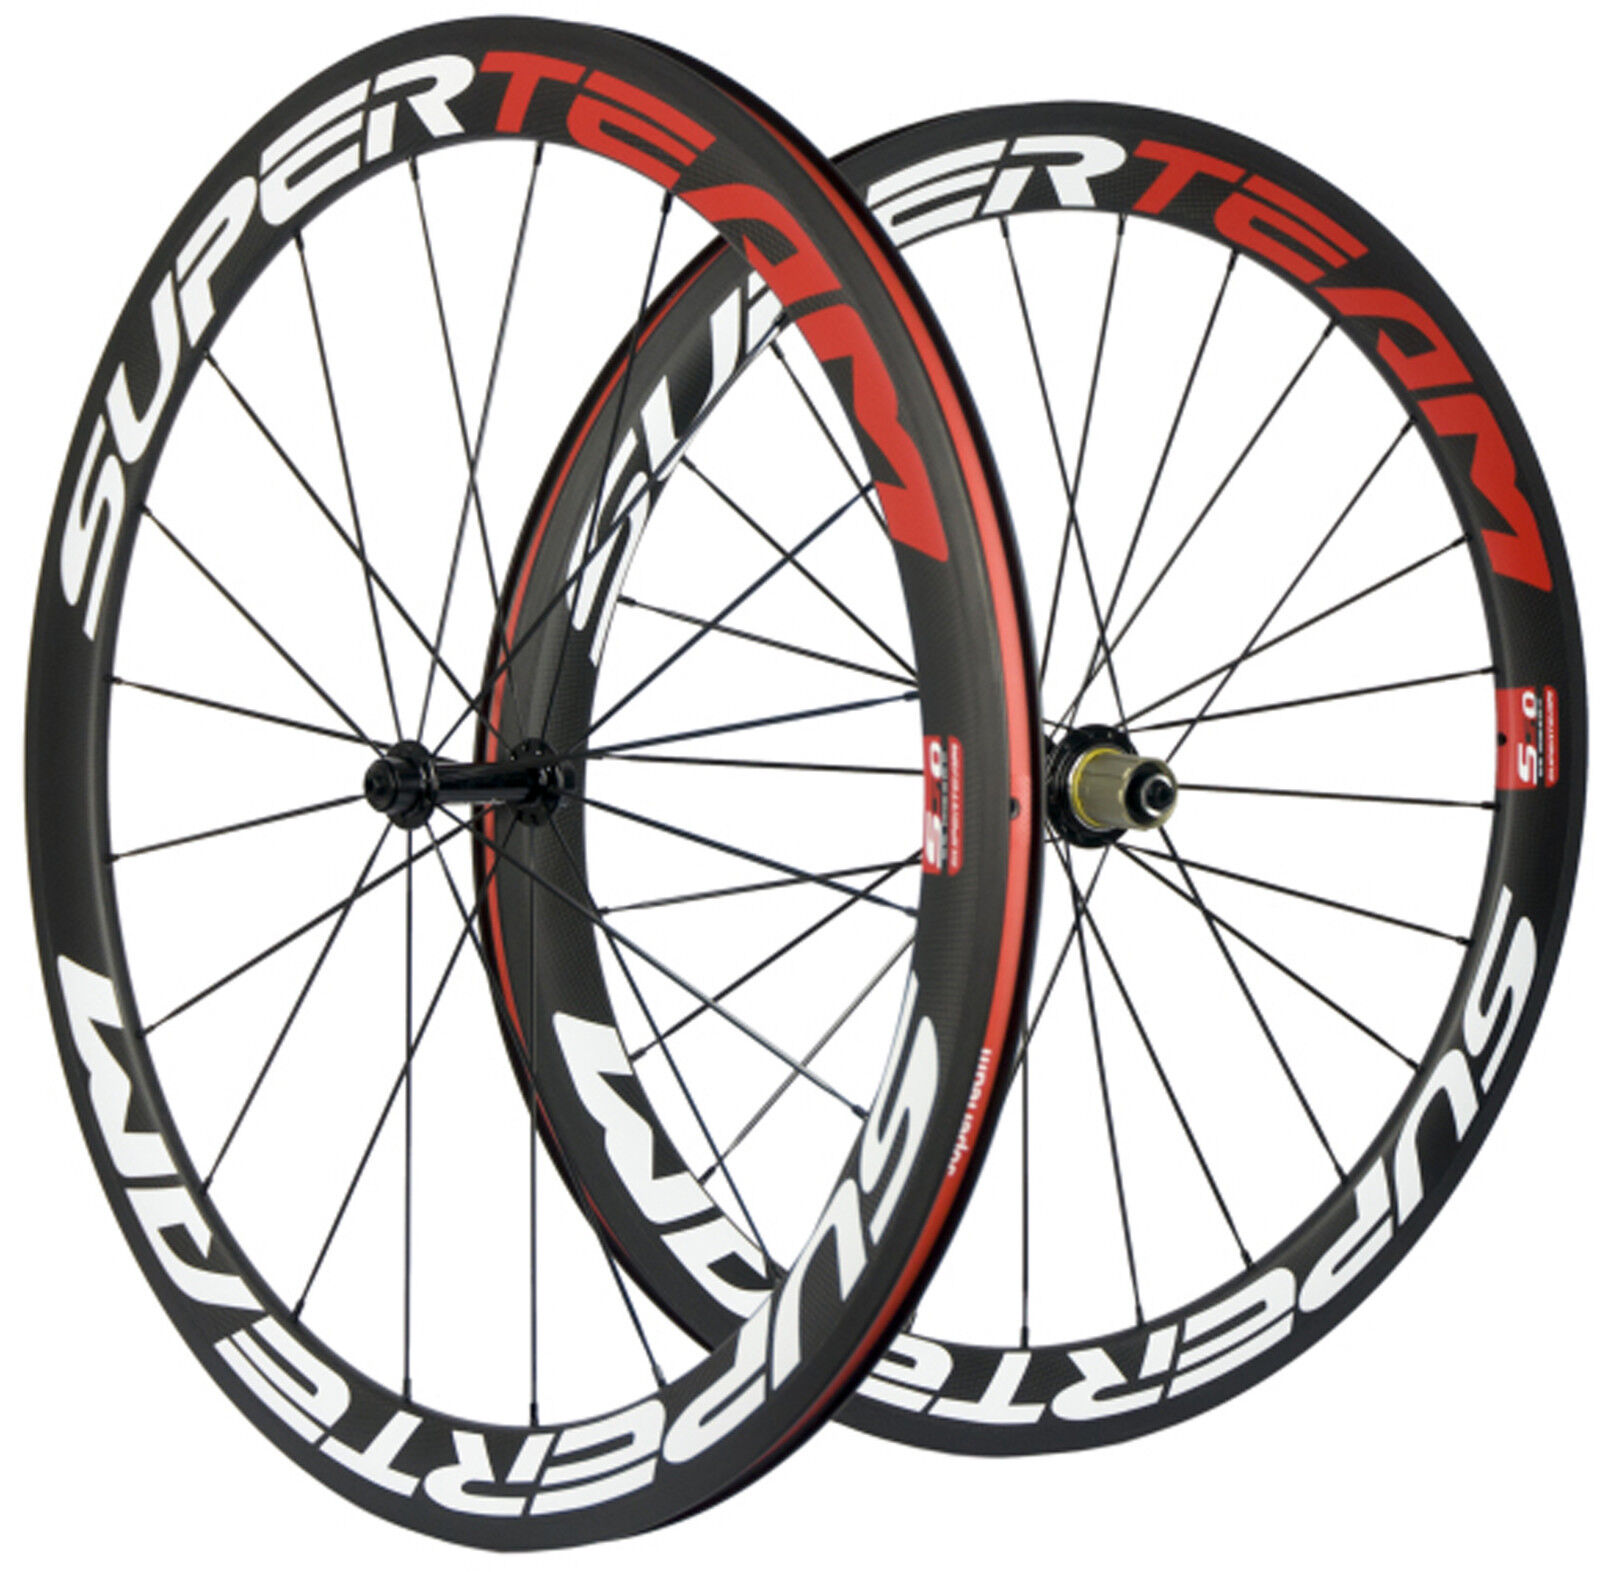 Superteam 700C 50mm Ultra Light  Carbon Wheels Clincher Carbon Road Bike Wheelset  the most fashionable